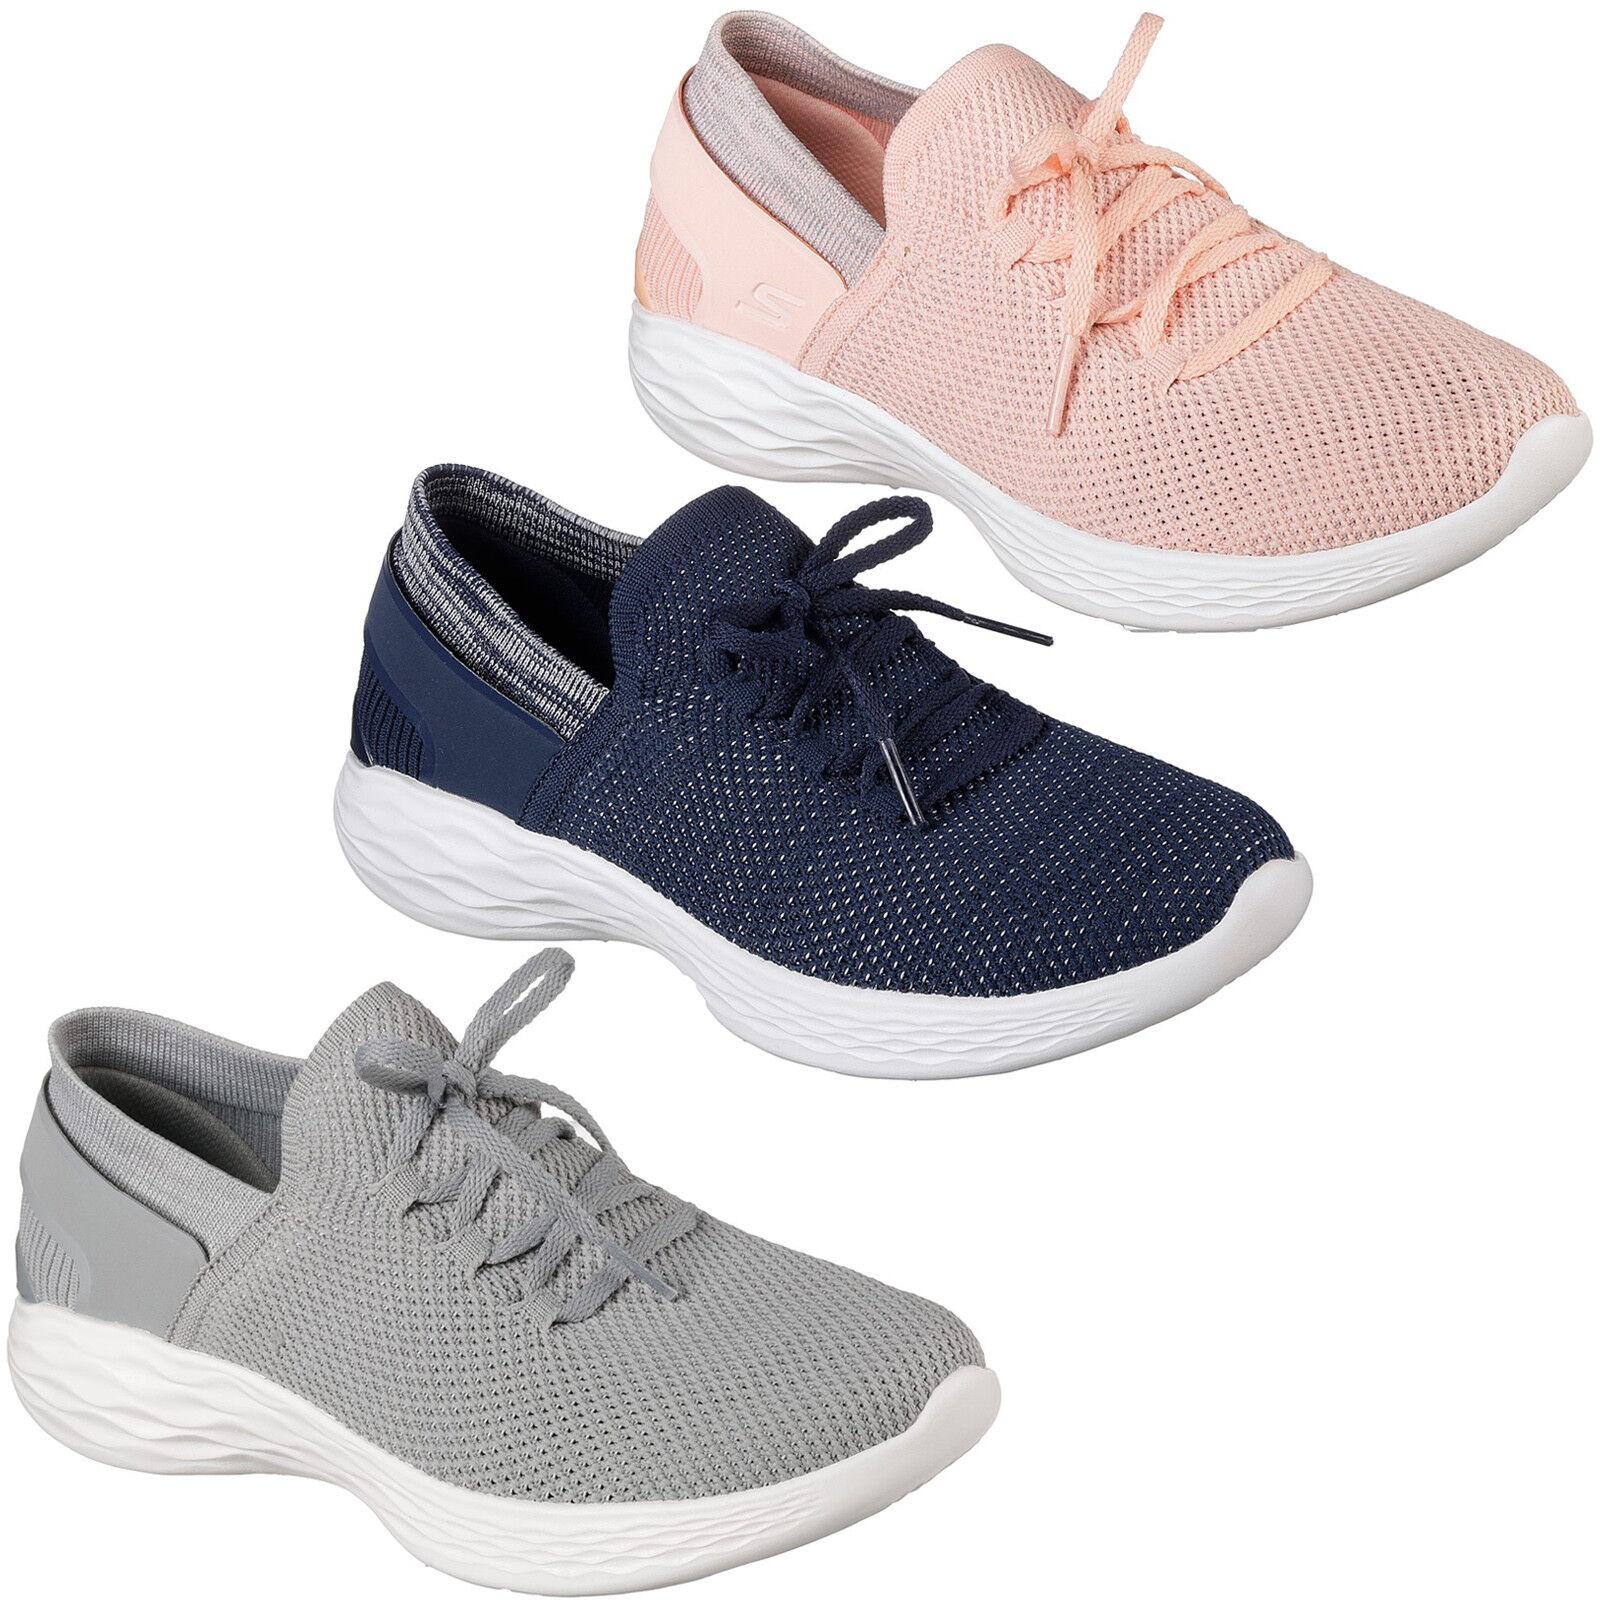 Distraer latín Desalentar  Skechers You - Spirit Trainers Womens Memory Foam Lifestyle Sports Shoes  14960   eBay